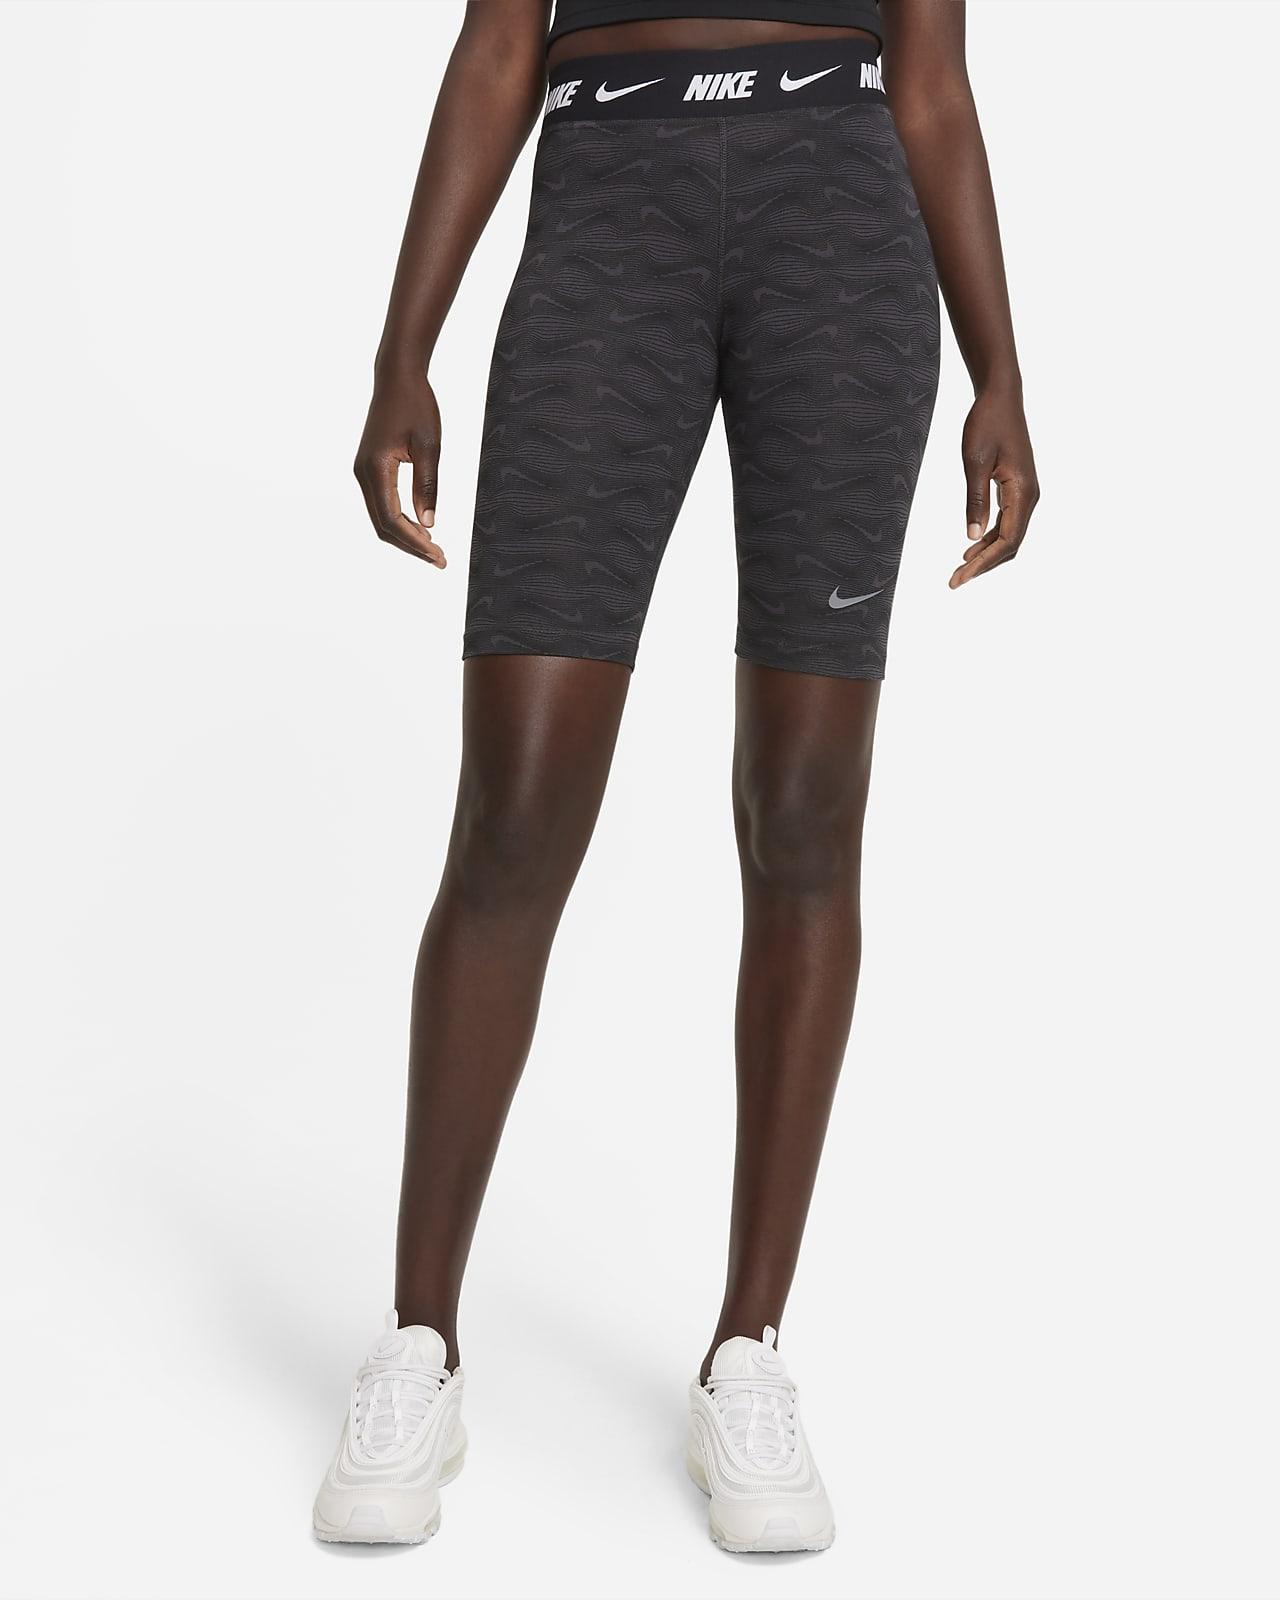 Nike Sportswear Women's Printed Shorts